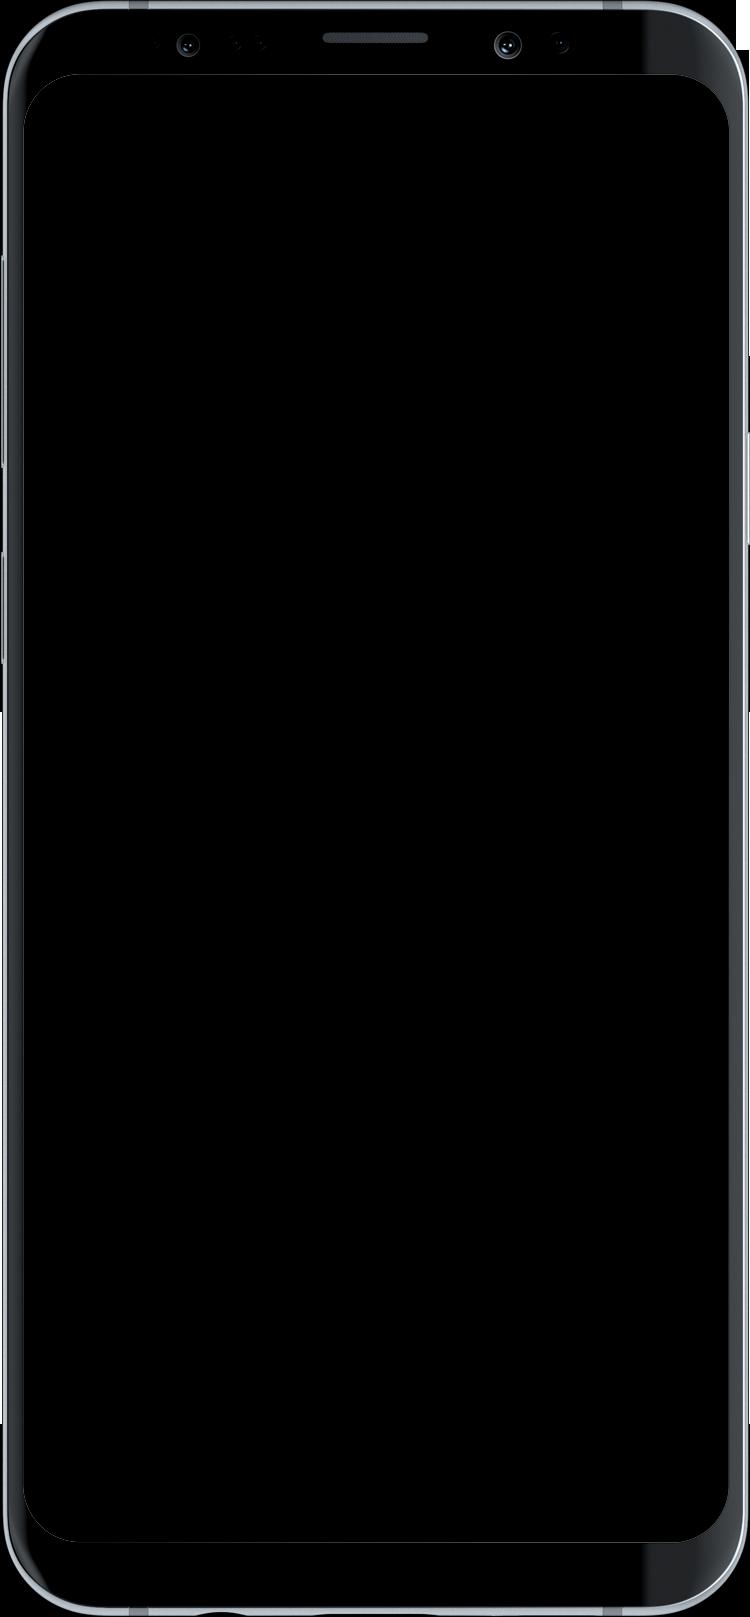 Plus mobile device